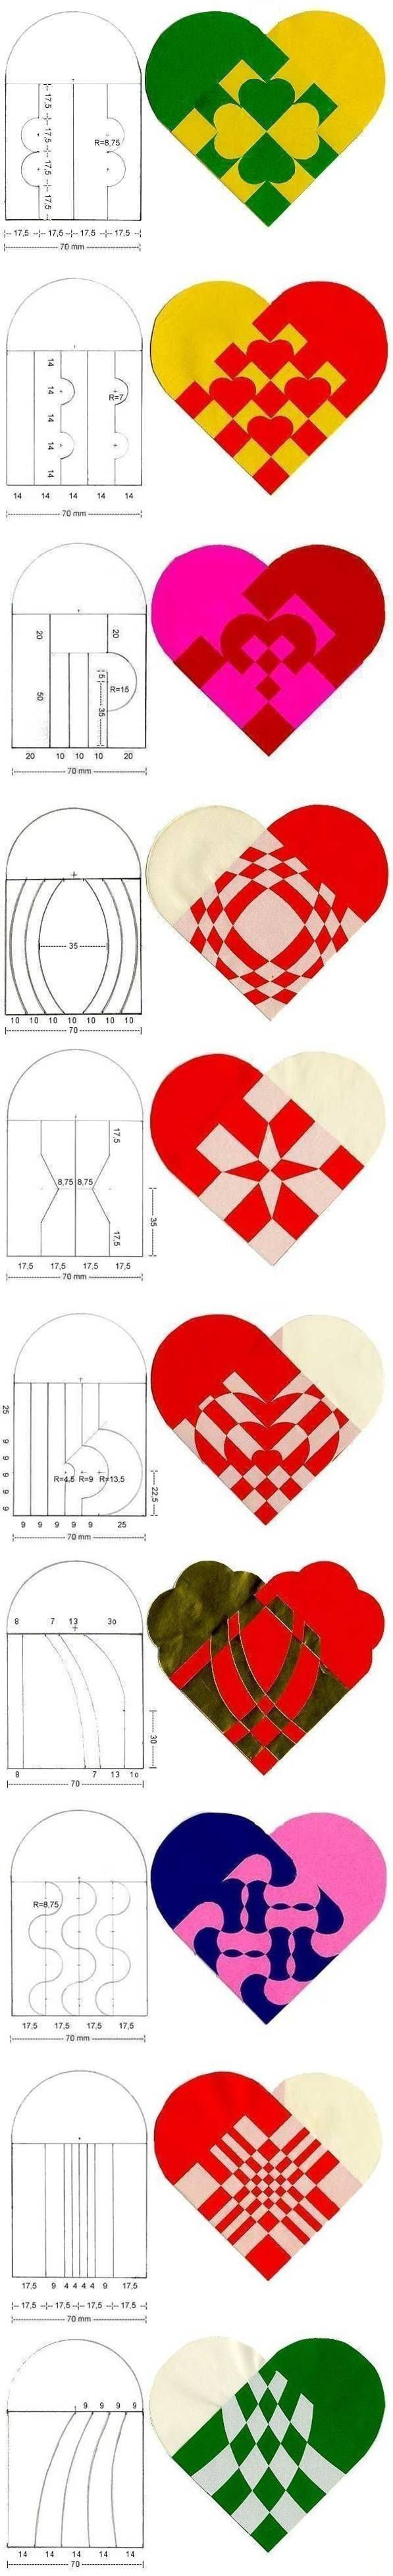 DIY Fabulous Heart Patterns DIY Projects   UsefulDIY.com